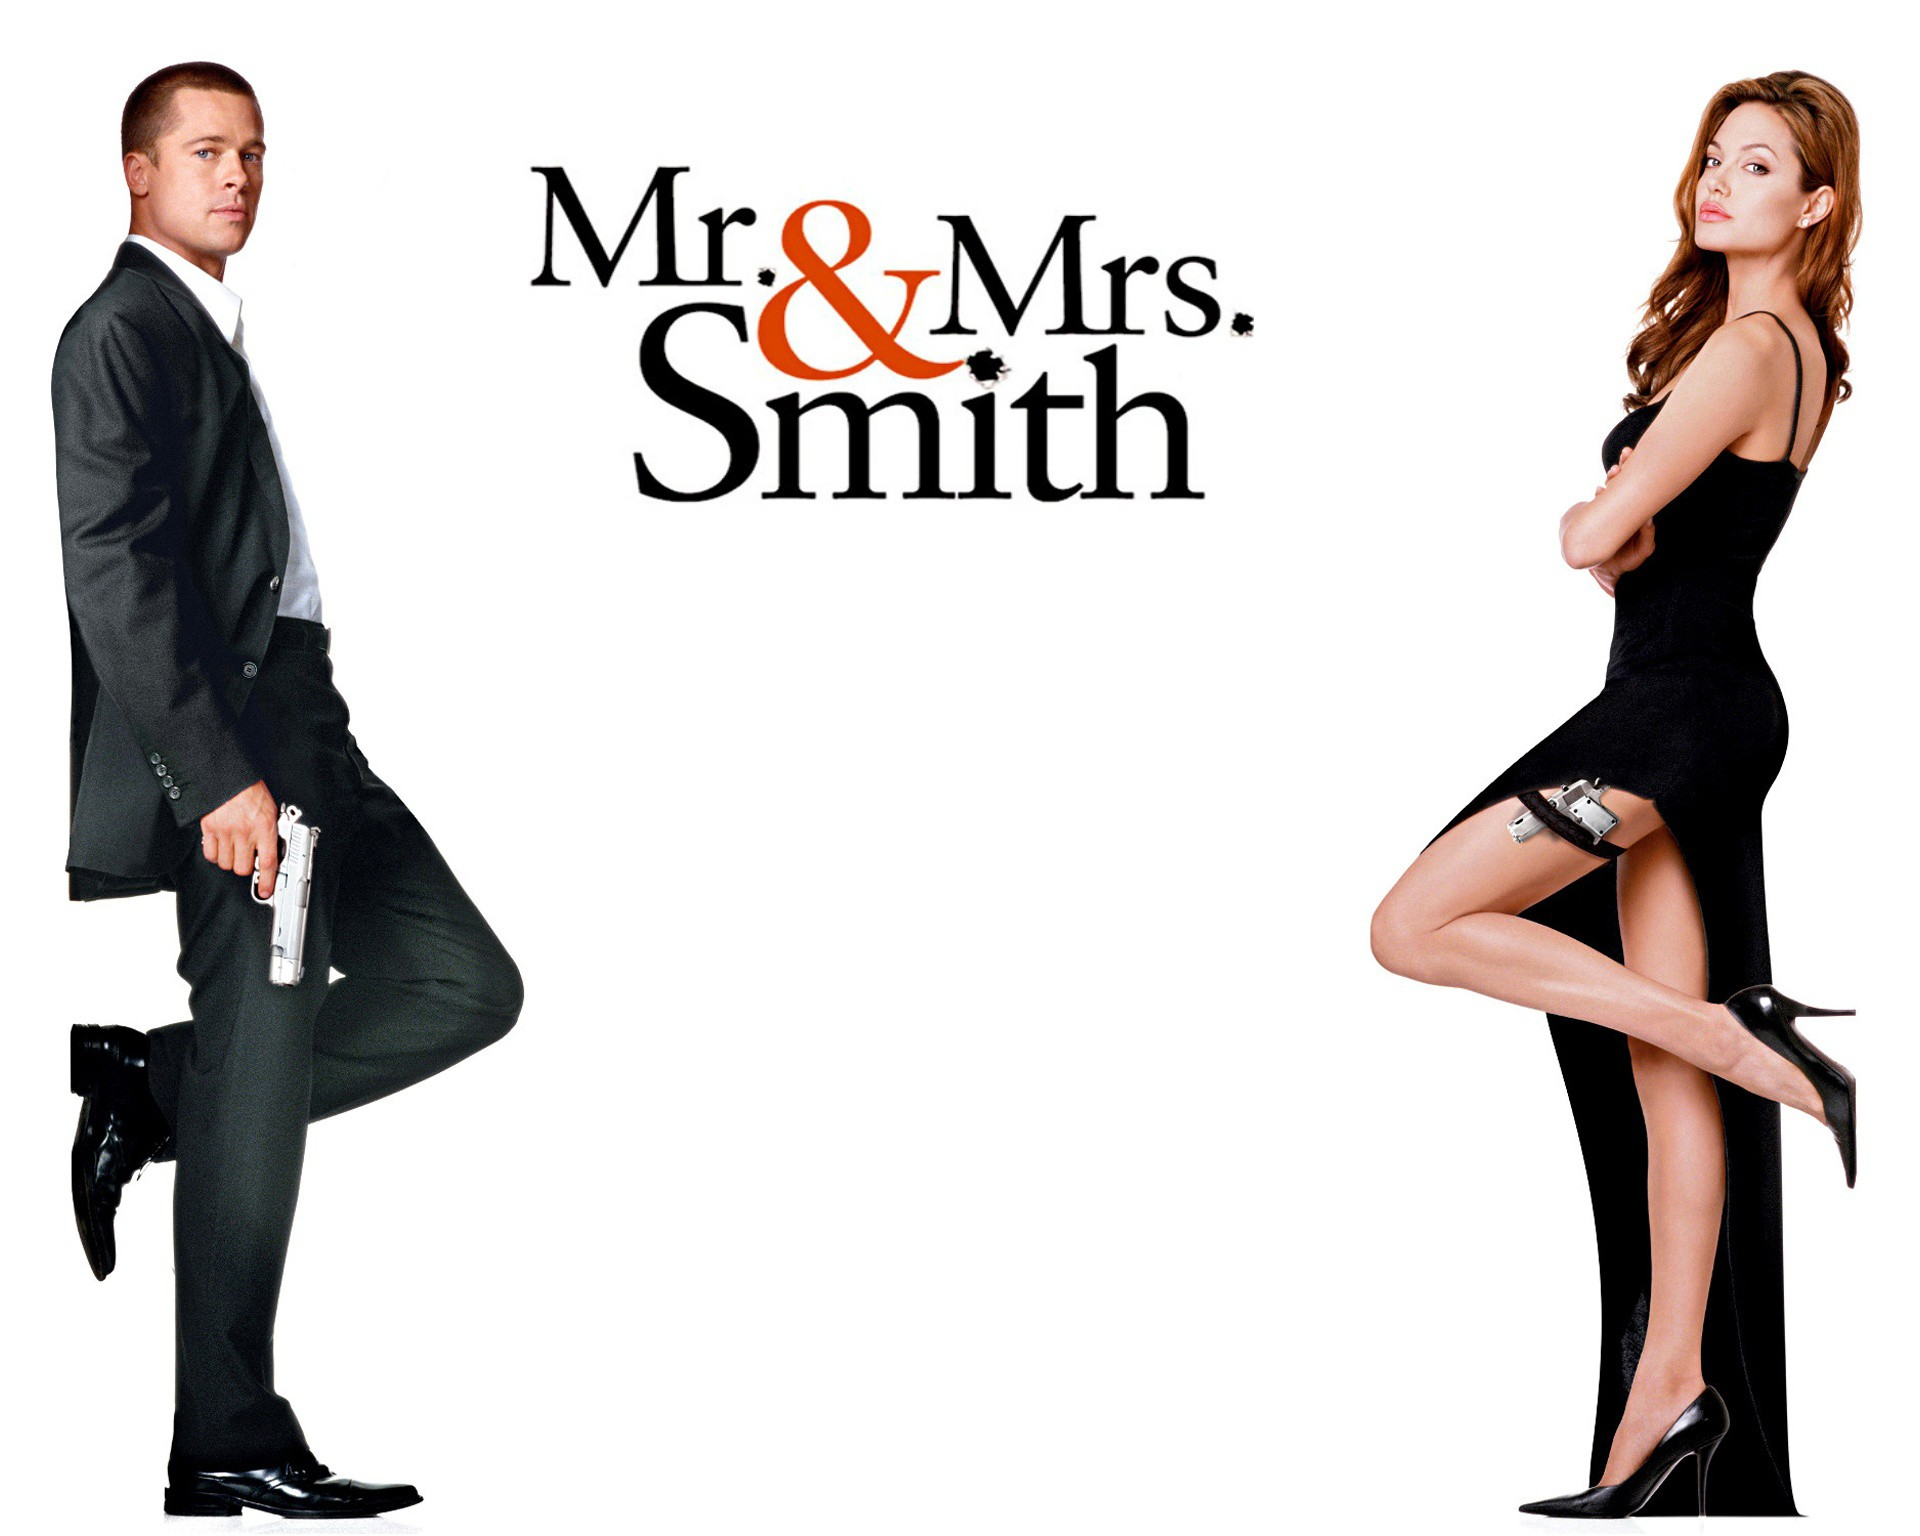 Mr.&Mrs. スミス(Mr. & Mrs. Smith)